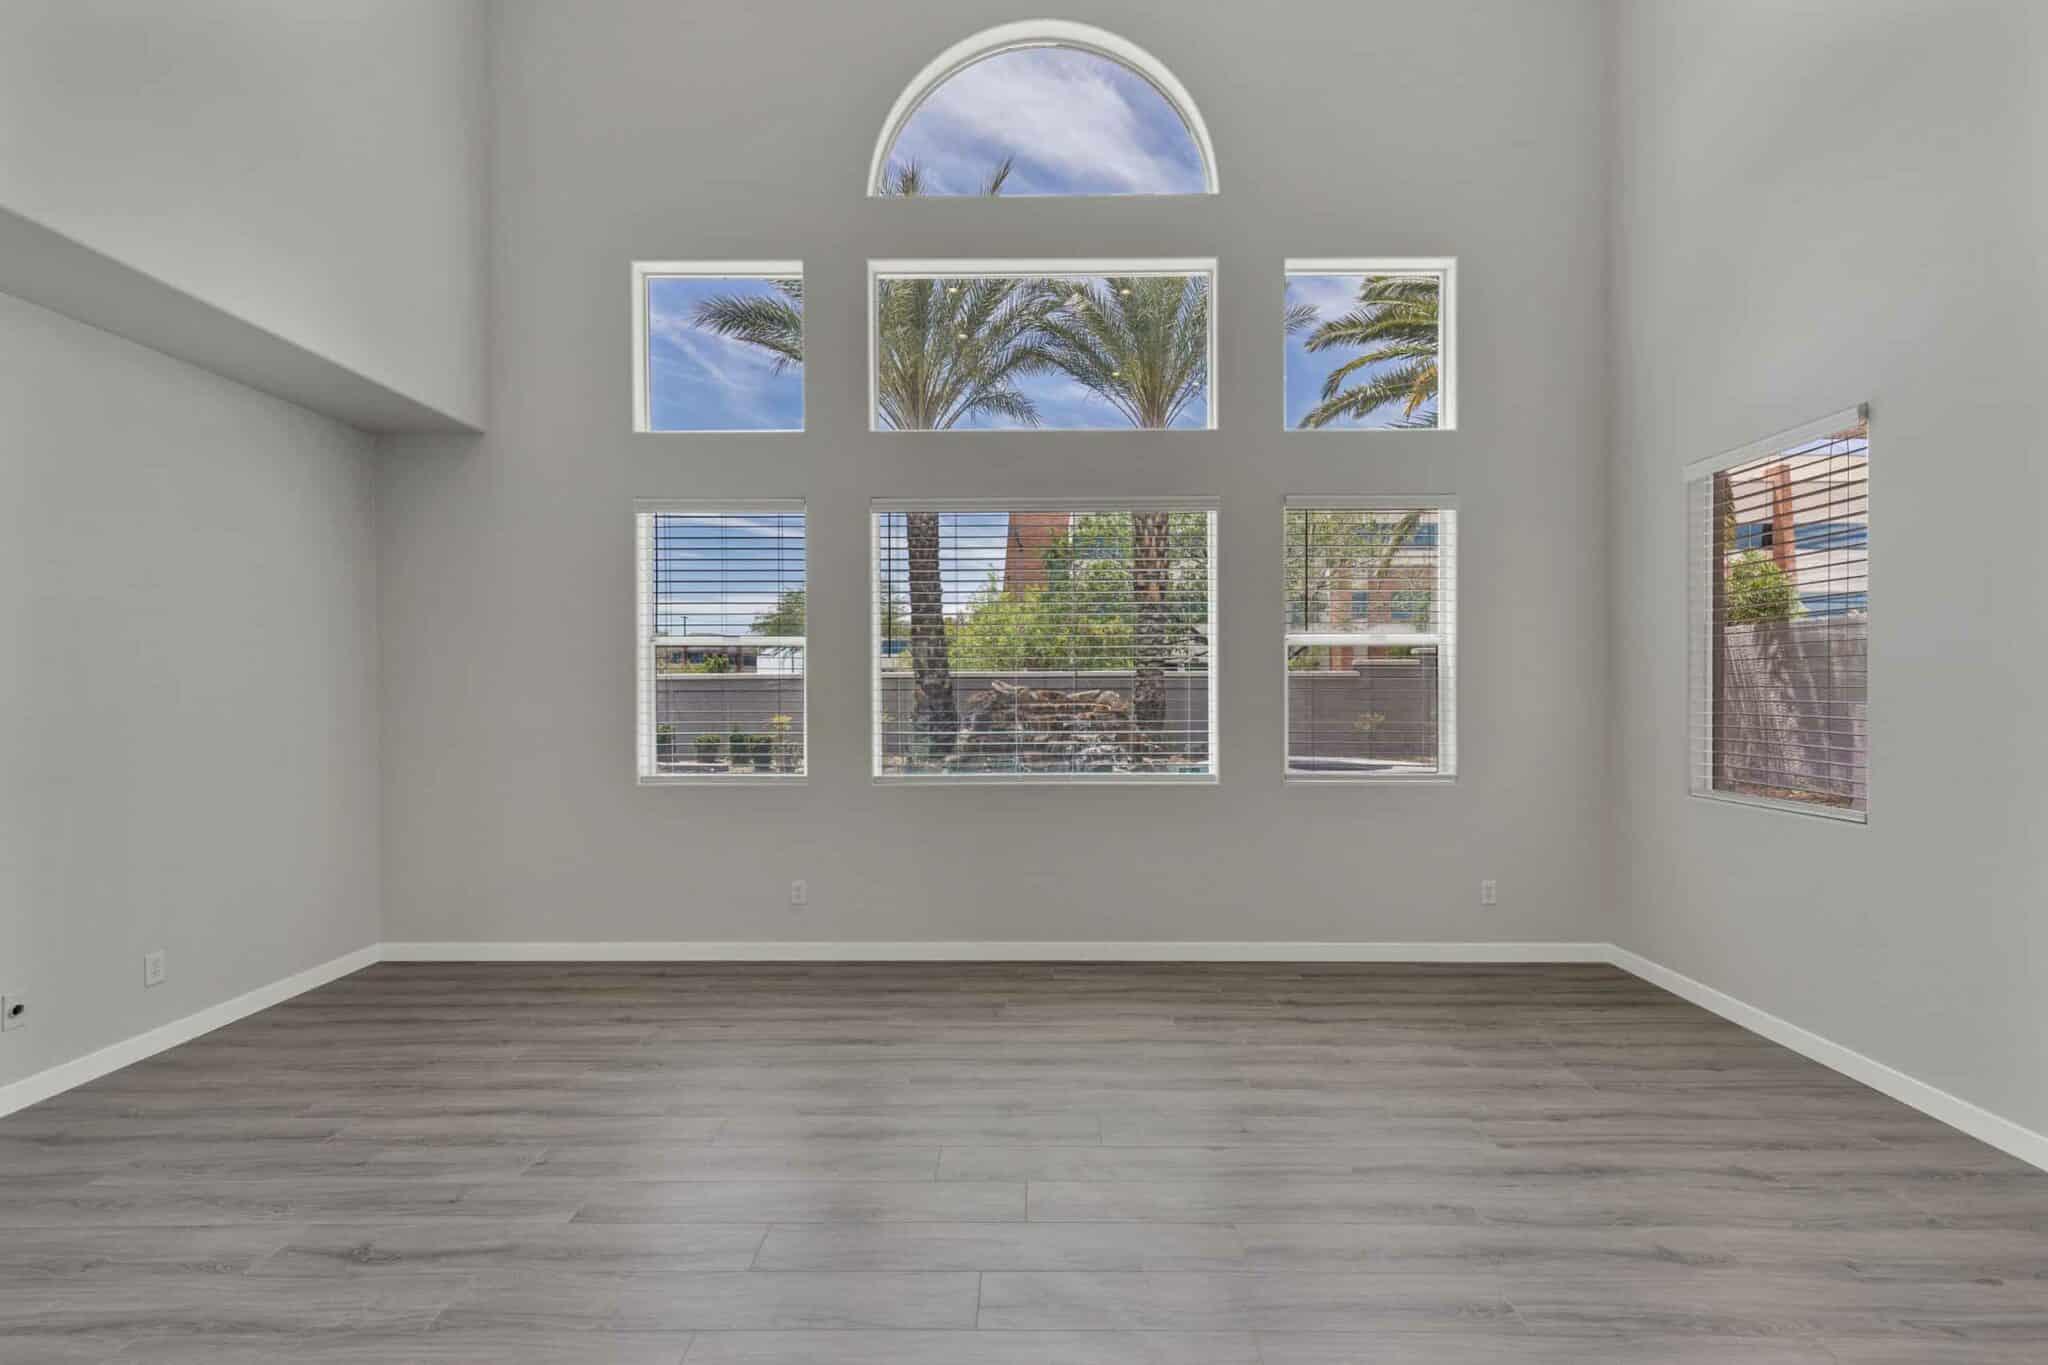 las-vegas-luxry-real-estate-realtor-rob-jensen-company-10491-haywood-drive-summerlin18